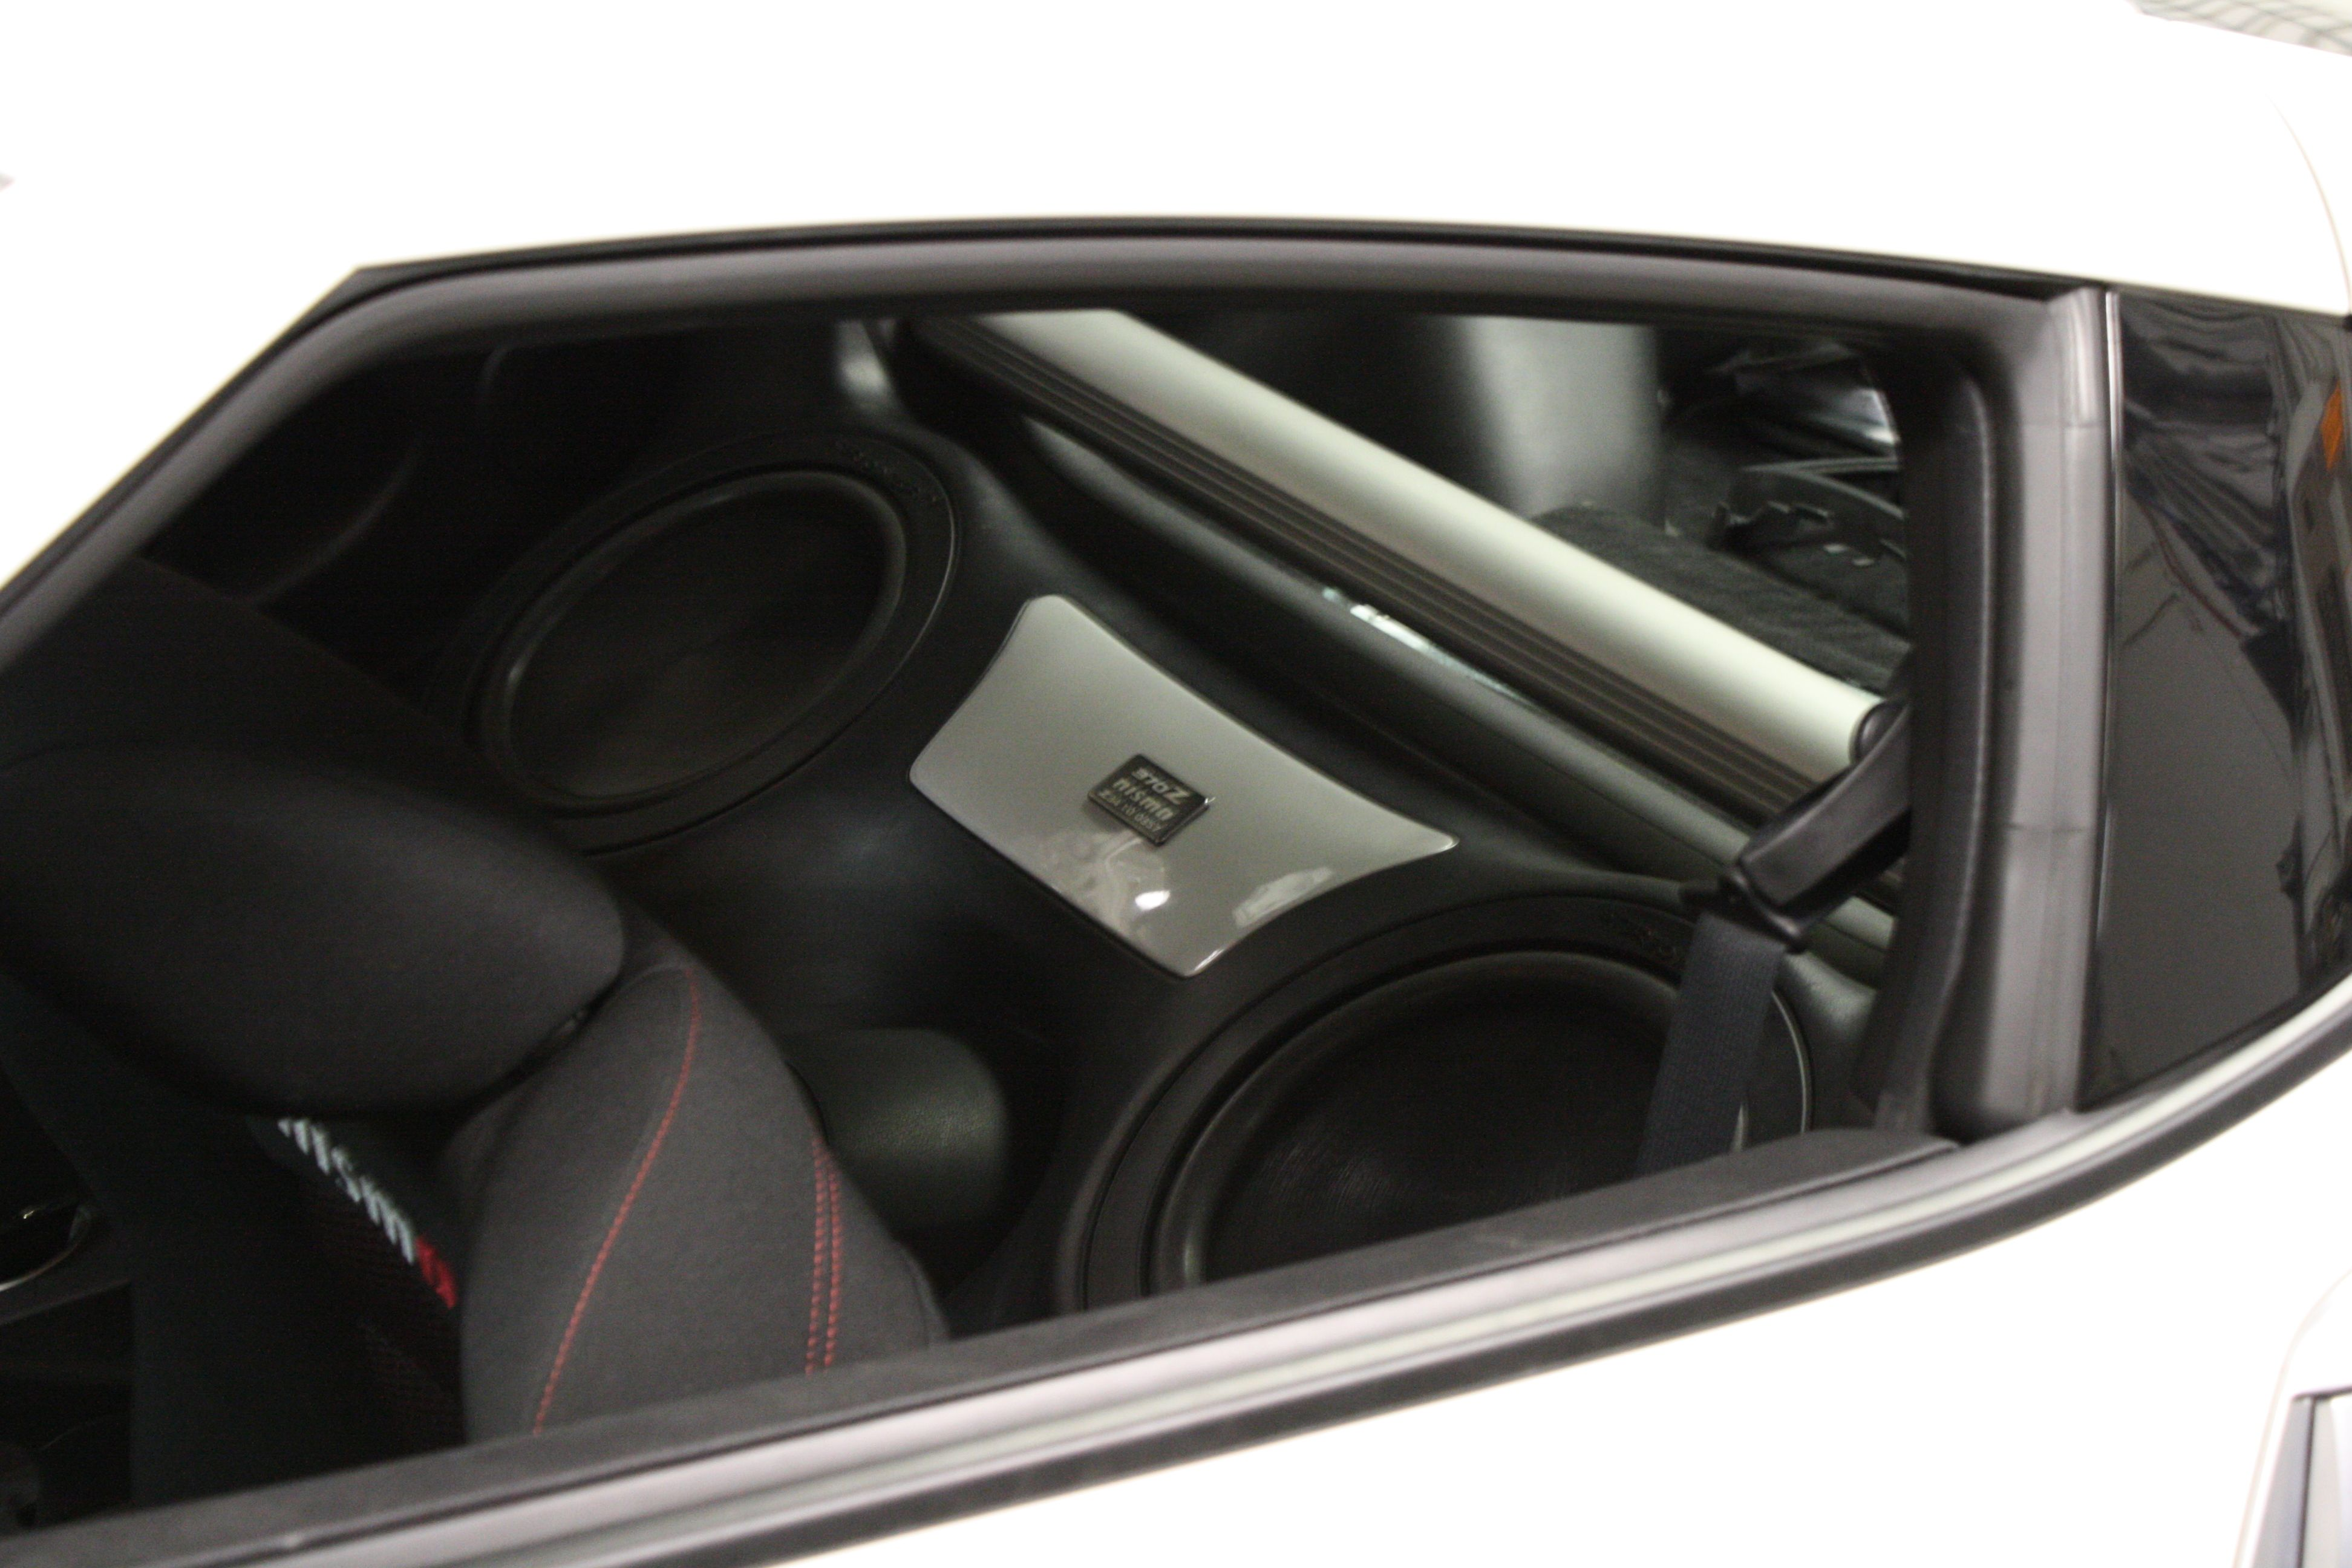 Nissan 370z Custom Fiberglass Subwoofer Enclosure 370z Custom Nissan 370z Subwoofer Enclosure